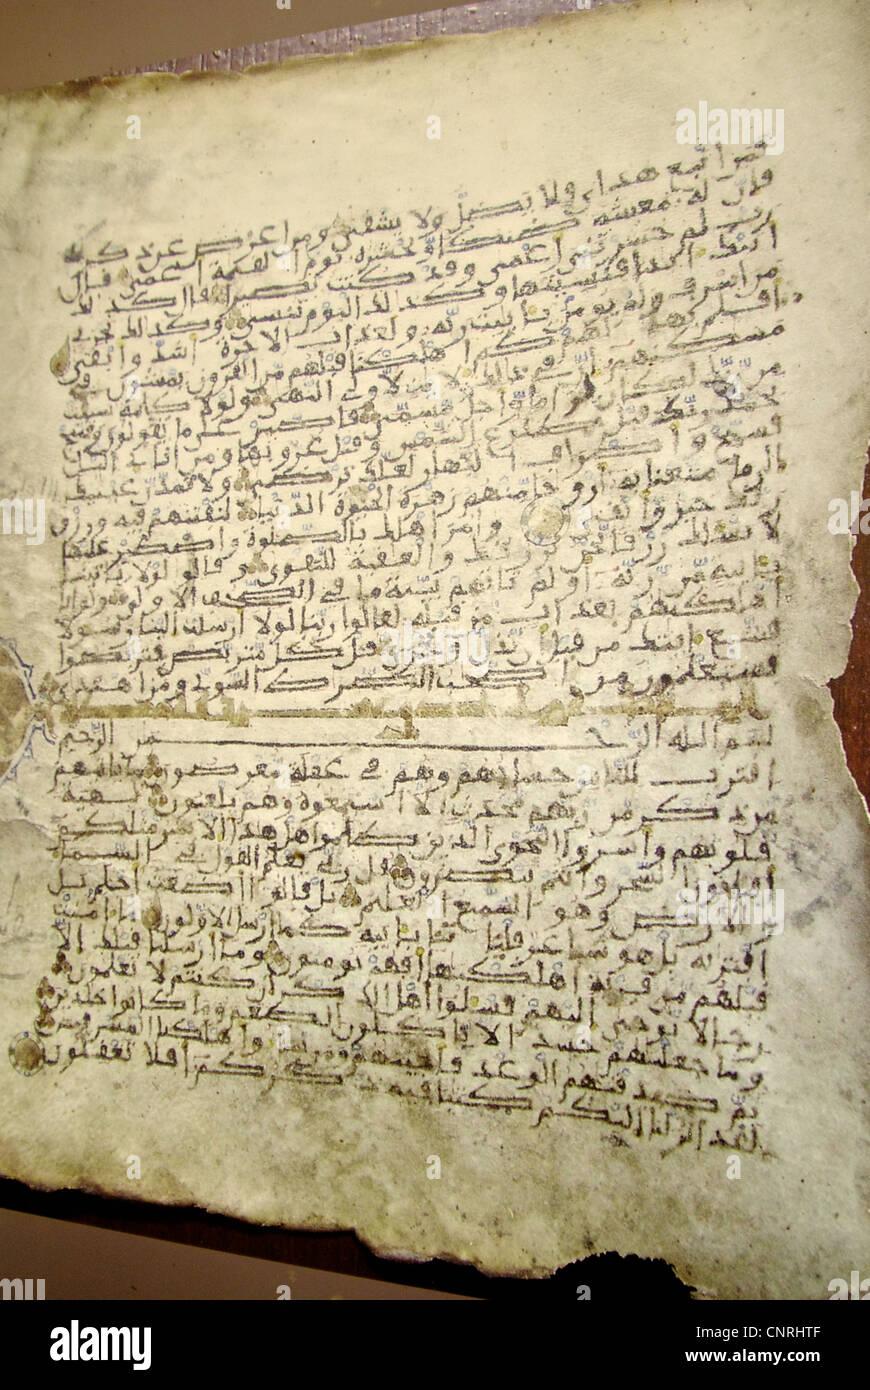 A scripture artifact in Timbuktu, Mali. - Stock Image